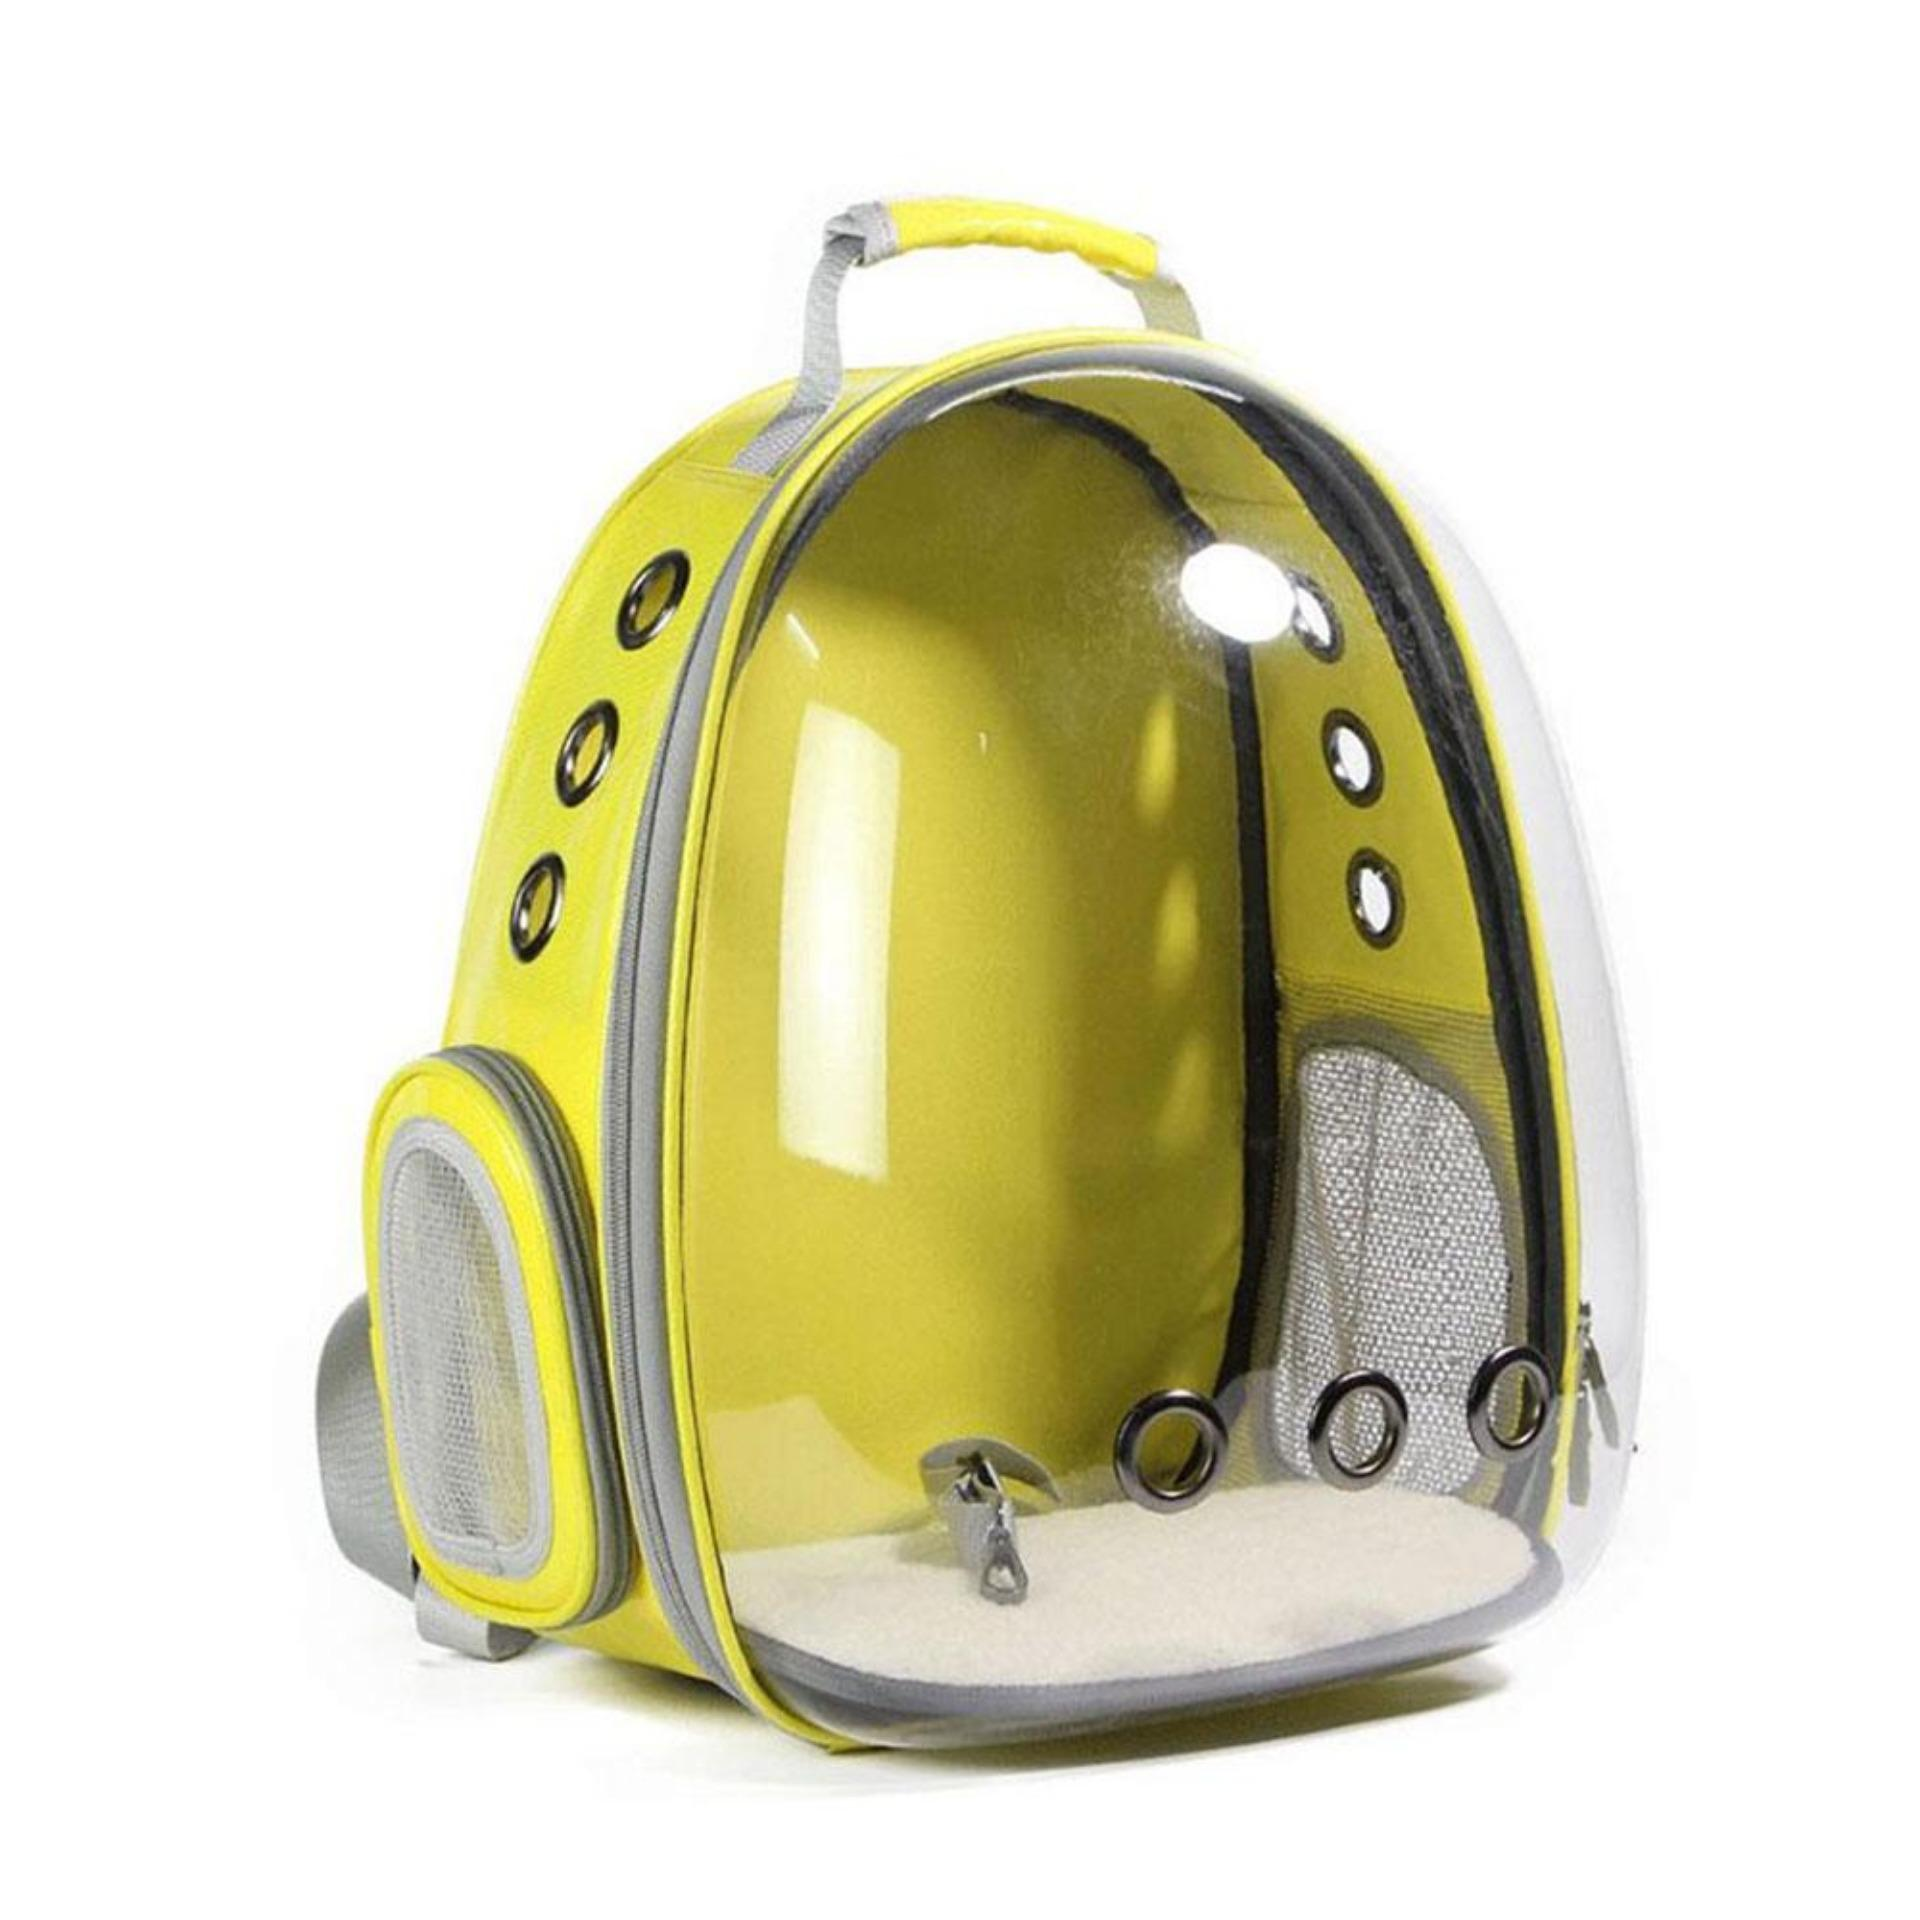 Lightsmile Pet Dog Carrier Backpack Bag Puppy Cat Dog Outdoor Hiking Travel Bag Pet Space Portable Bag Capsule Shaped Pet Carrier Backpack By Lightsmile.